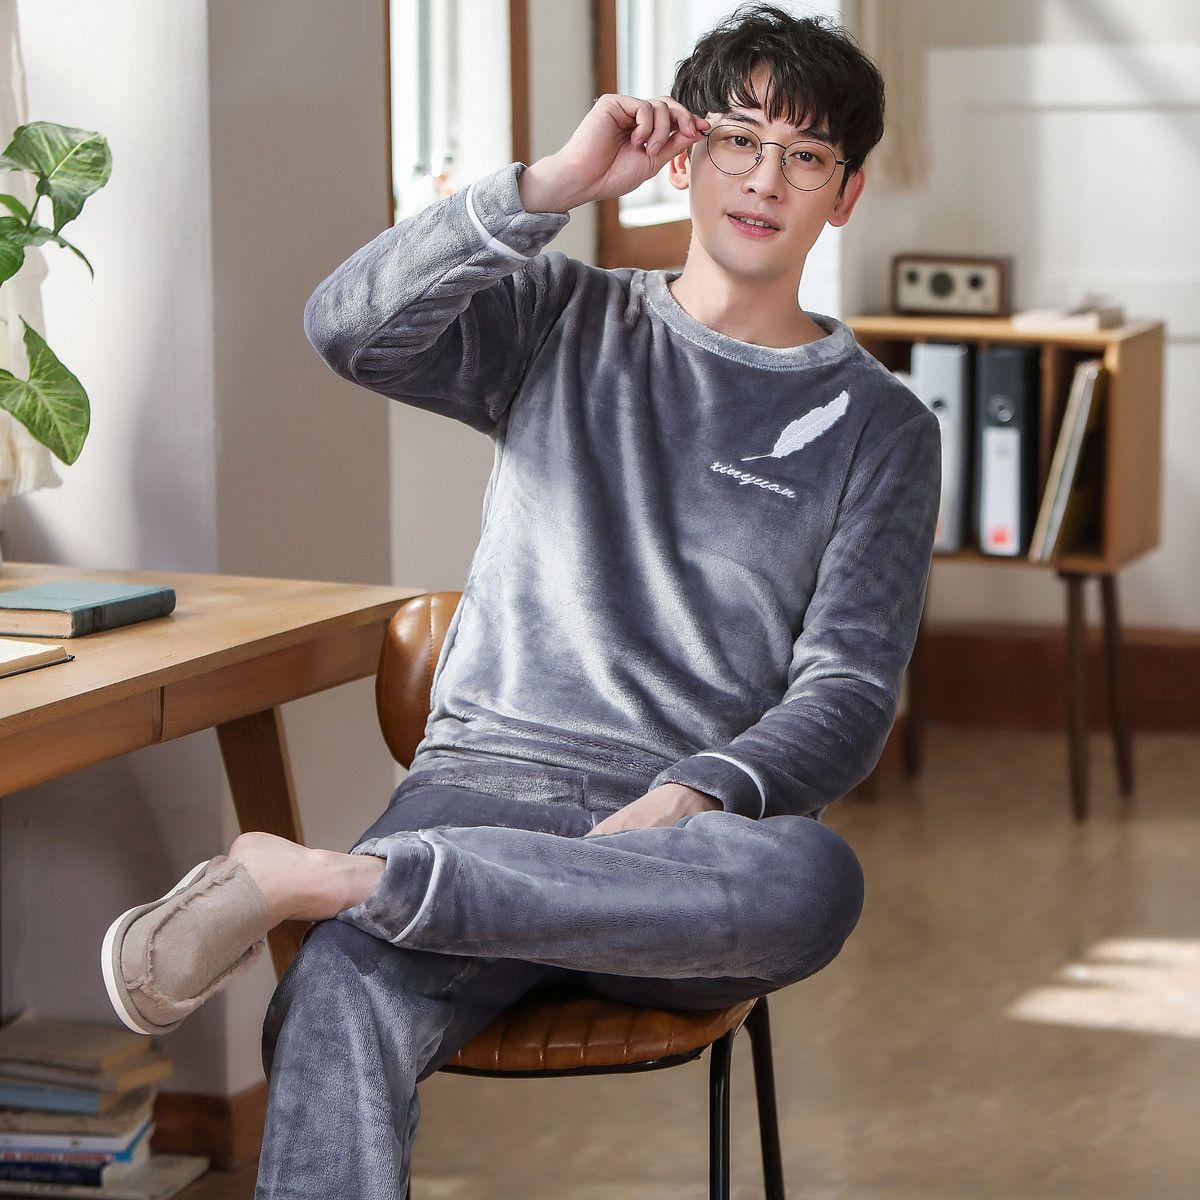 Pigiama manica lunga inverno per uomo Addensare Flanella Sleepwear Suit 2 Pz Pajama Homme Calda Casual Home Abbigliamento Pijama Hombre